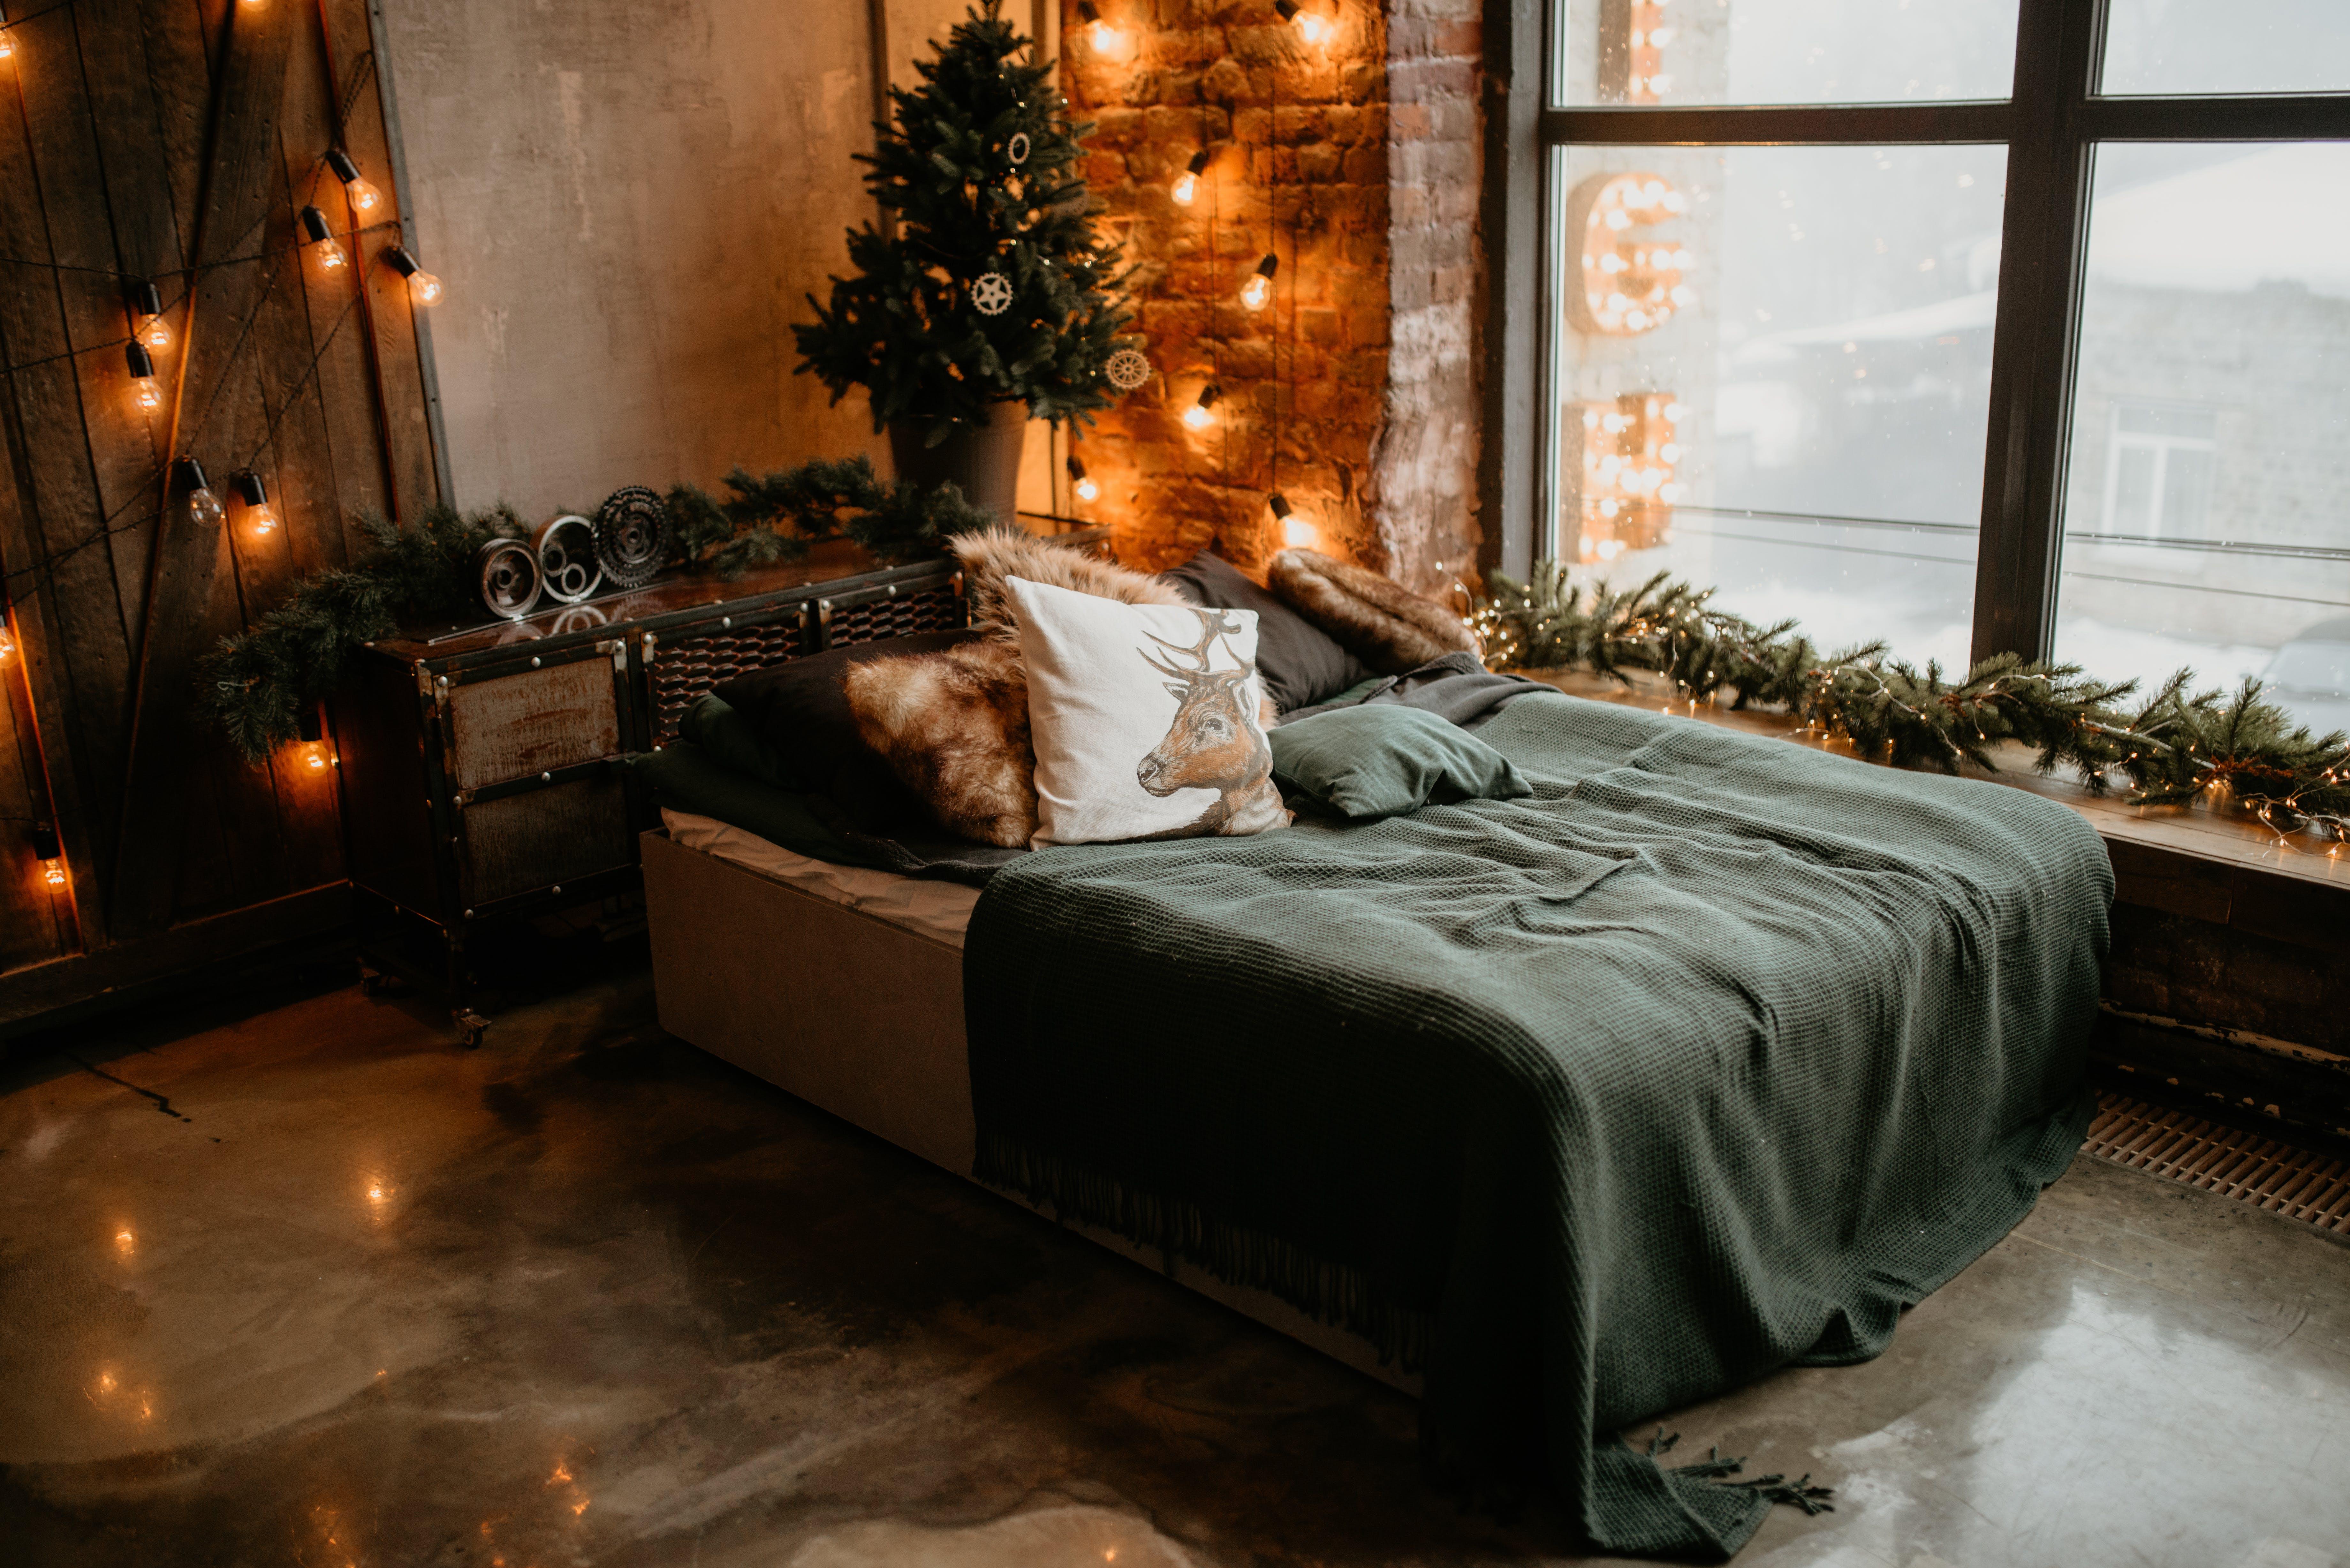 Green Bedspread